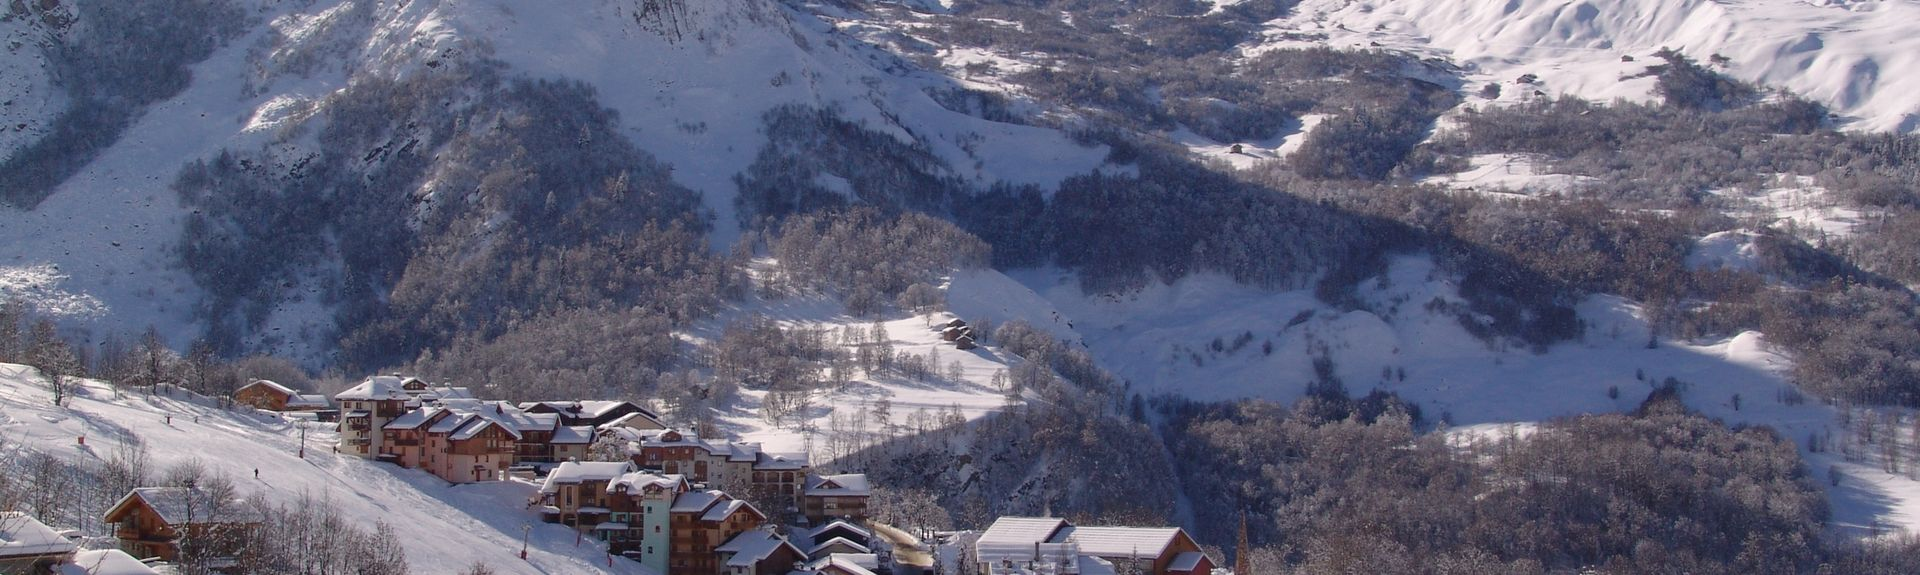 Saint-Martin-de-Belleville, Auvergne Rhône-Alpes, Francja